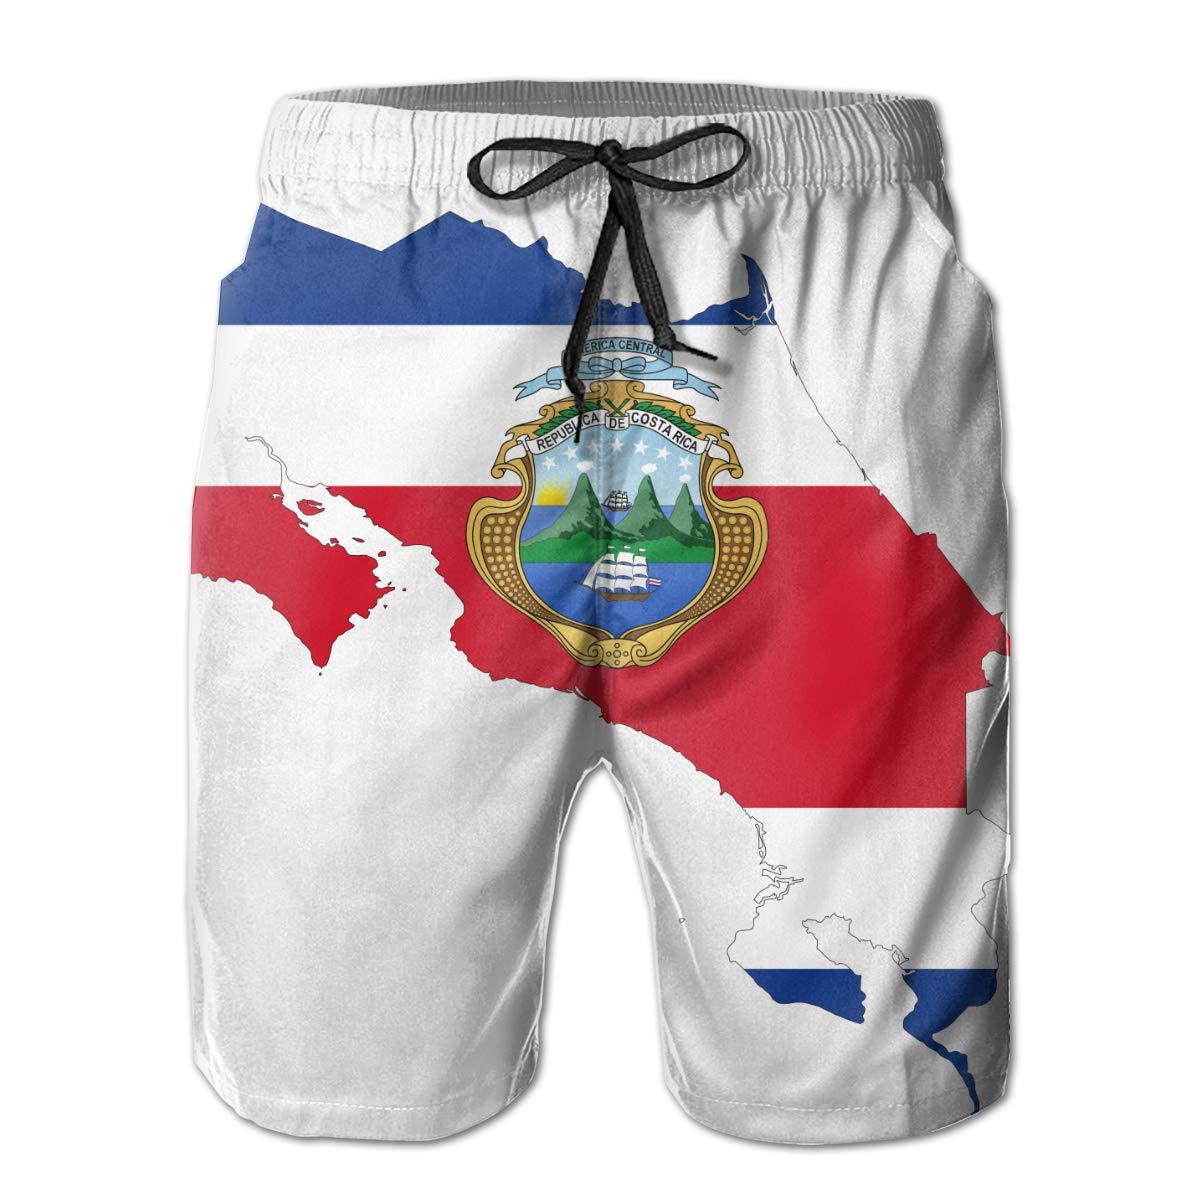 HZamora/_H Men Costa Rica Map Flag Summer Breathable Quick-Drying Swim Trunks Beach Shorts Board Shorts L